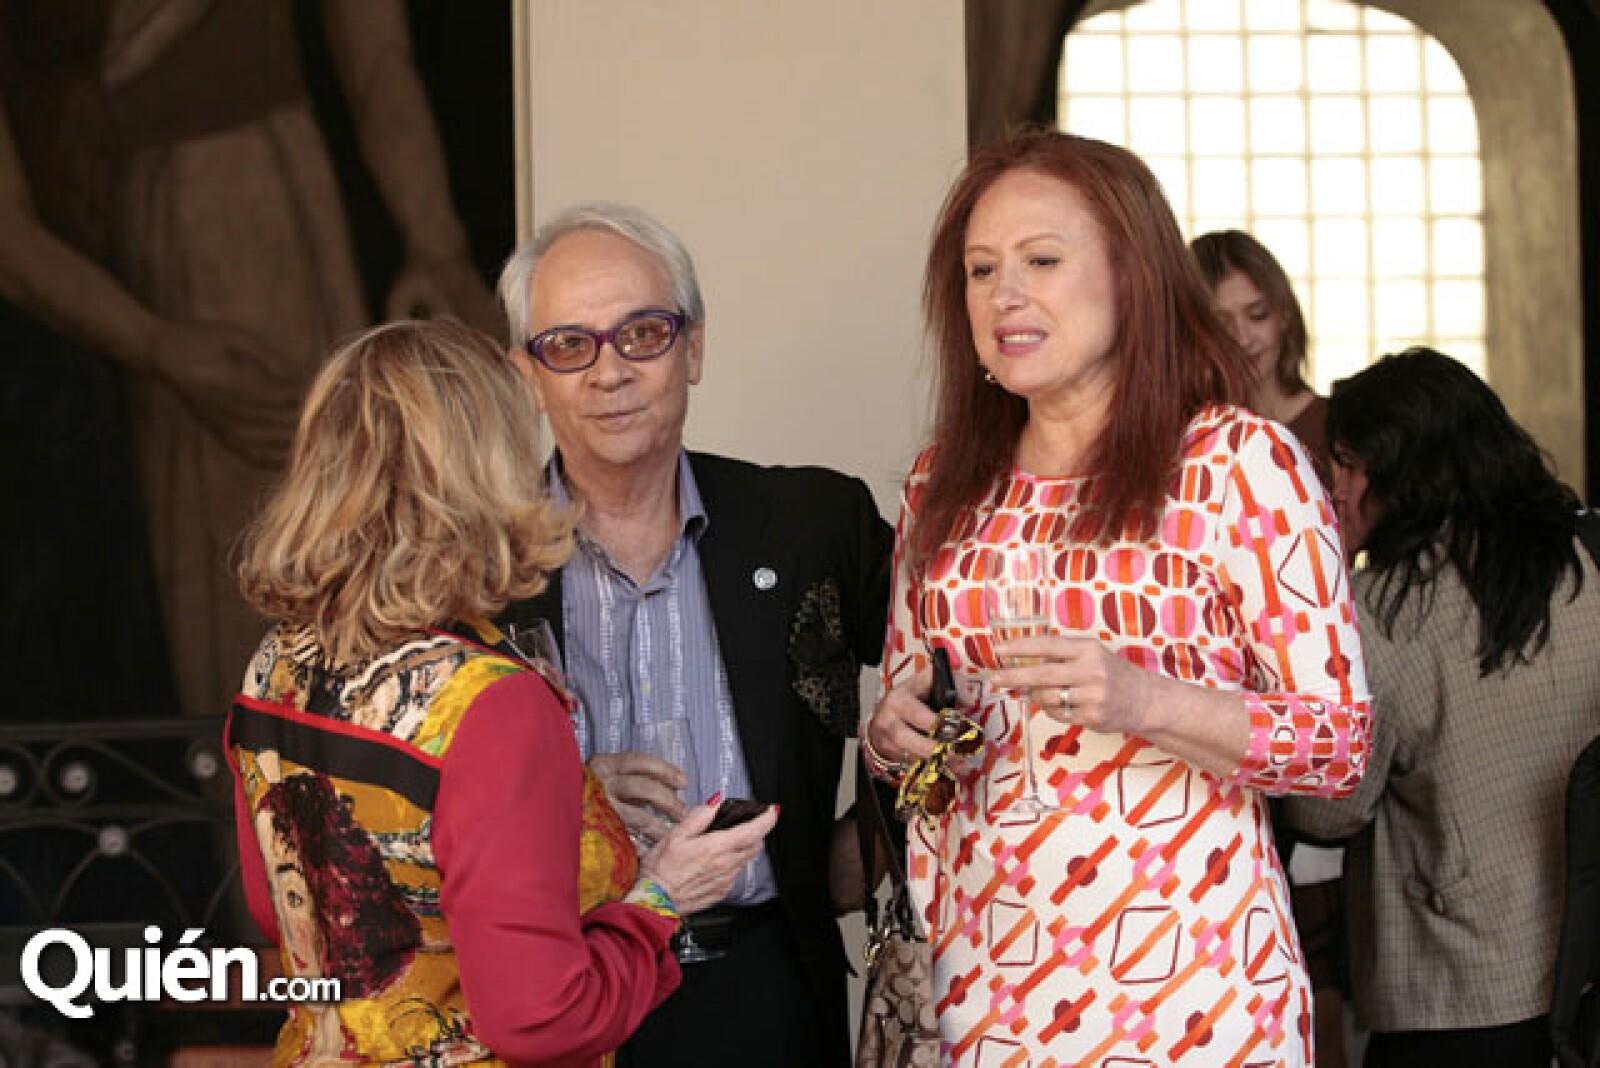 Doris Beckmann, Esteban León y Meli Lichtinger